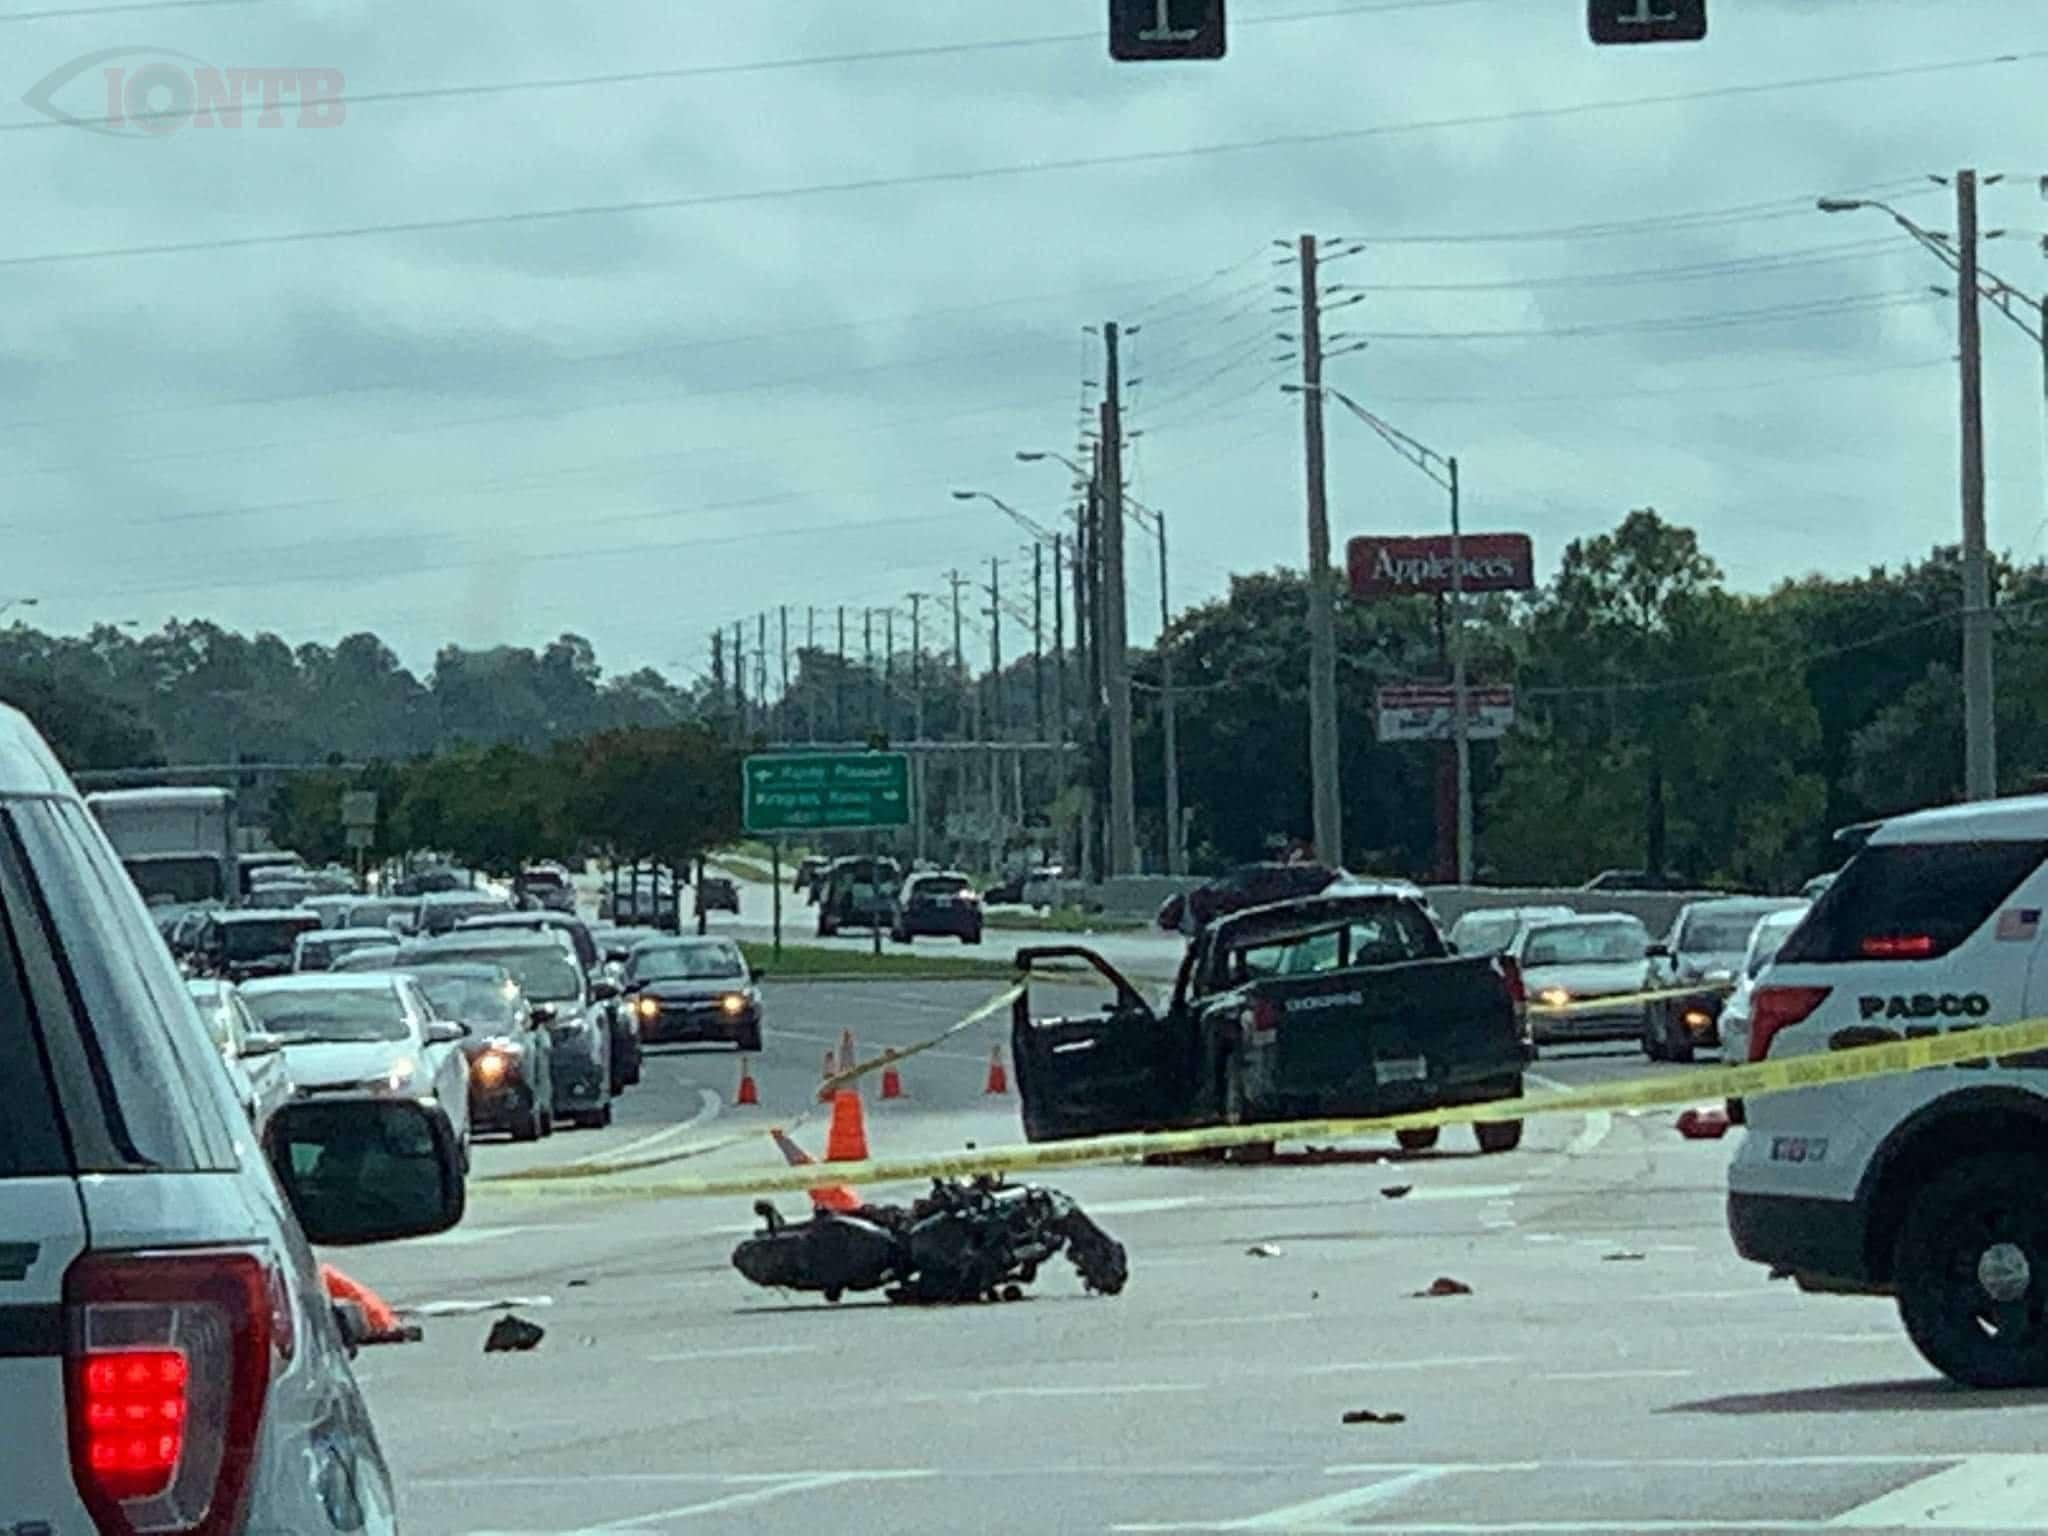 Carjacking Couple Sought Following Fatal Hit-and-Run Crash